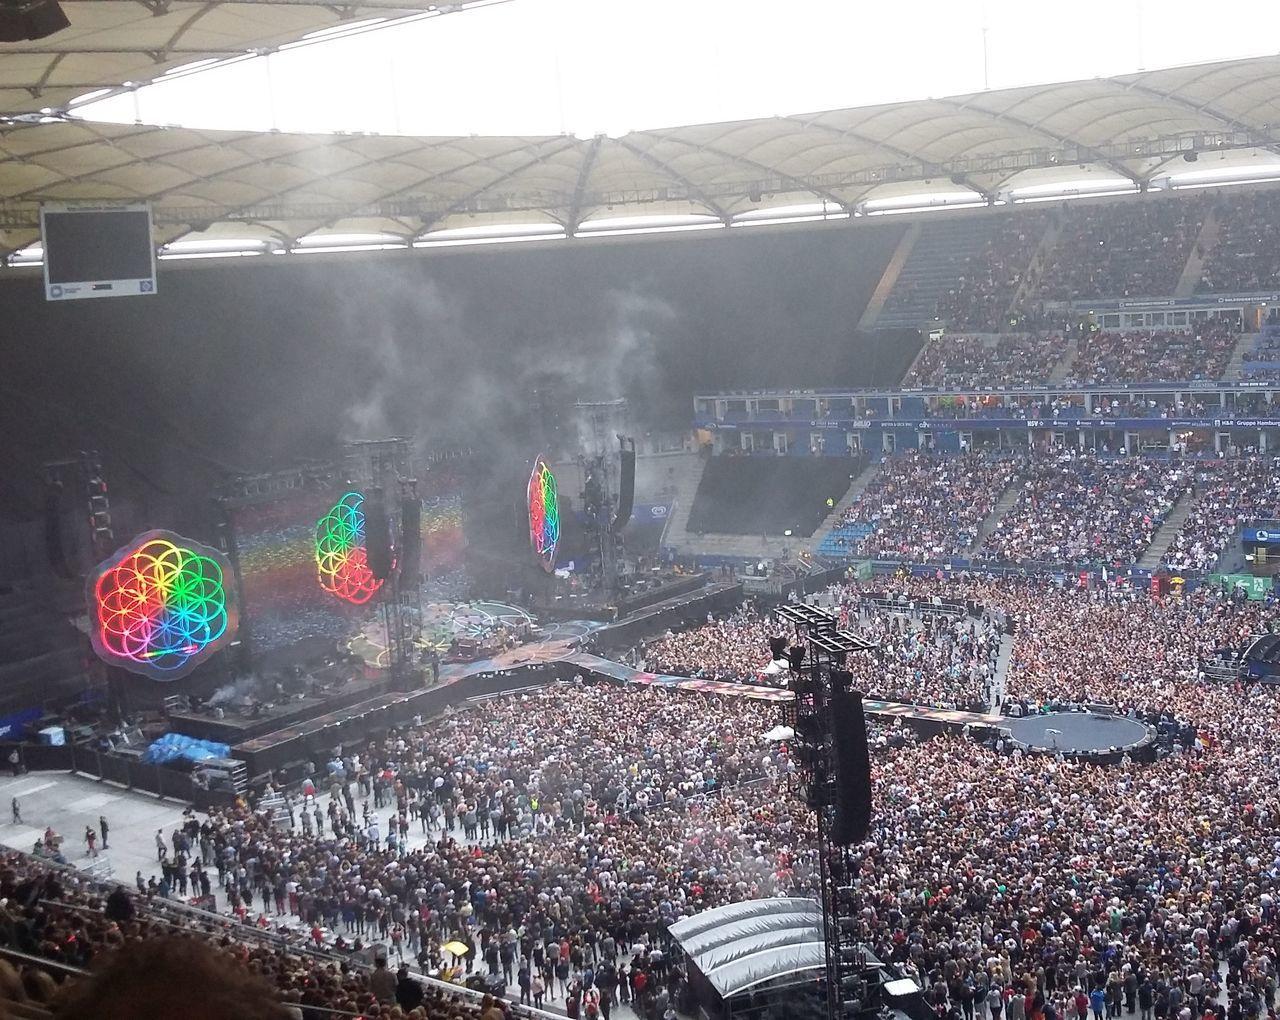 It was breathtaking Coldplay Concert  COLDPLAY ♥ Coldplay Concert Concert Photography Christmas Gift Hamburg